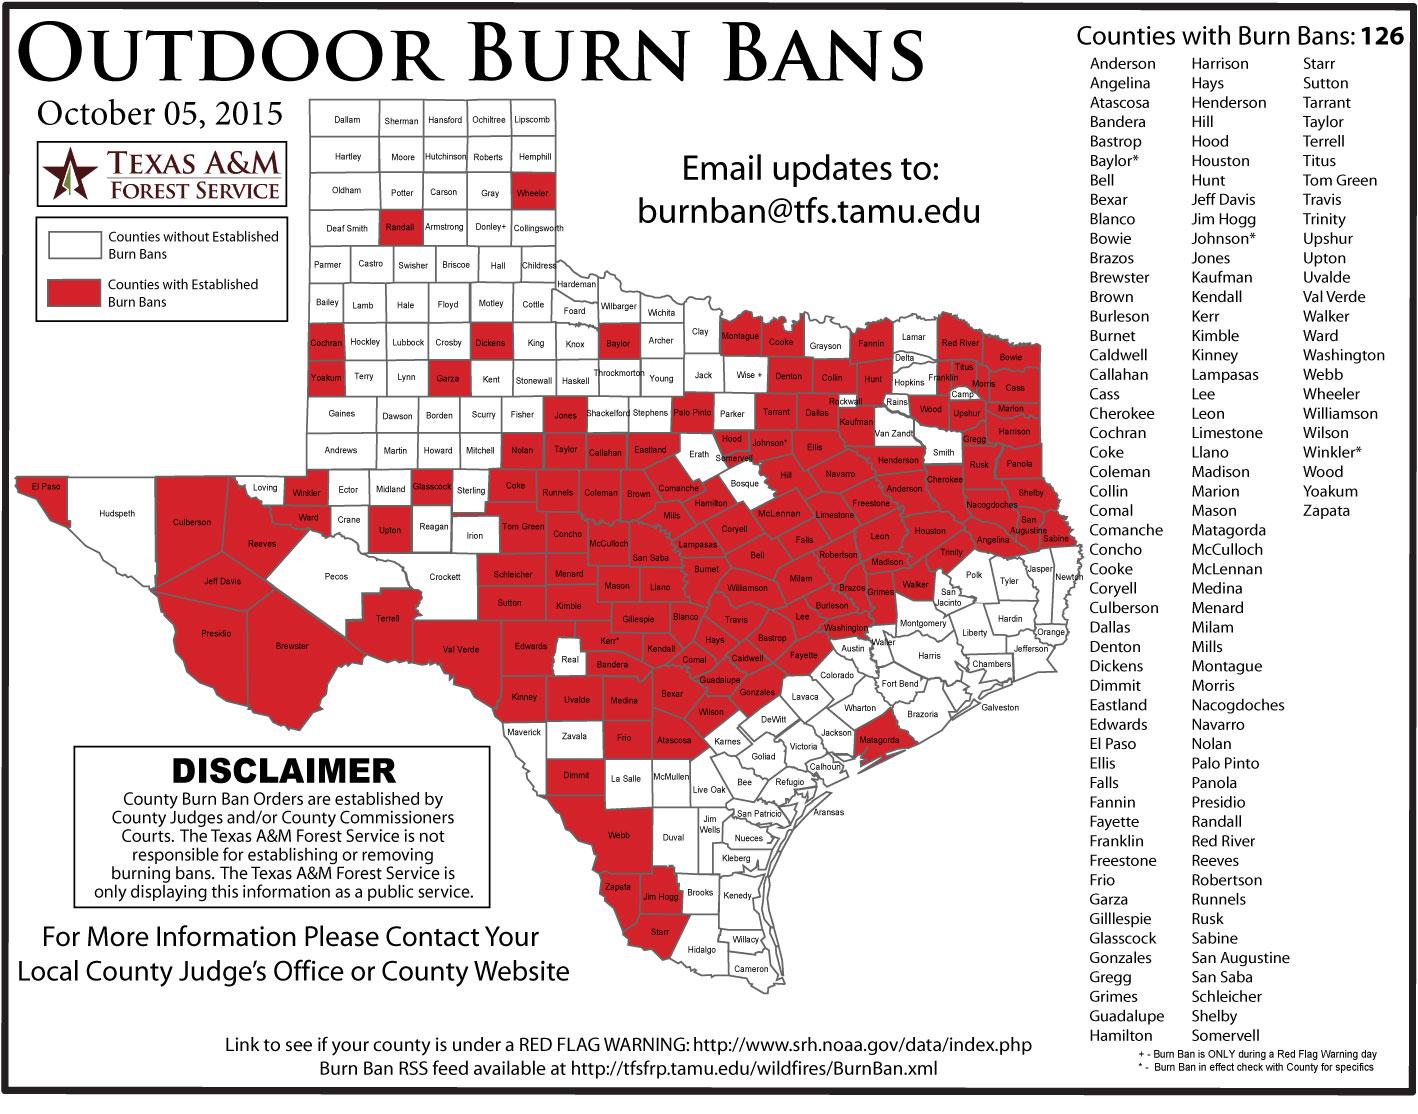 Burn Ban Map Texas   Business Ideas 2013 - Burn Ban Map Of Texas